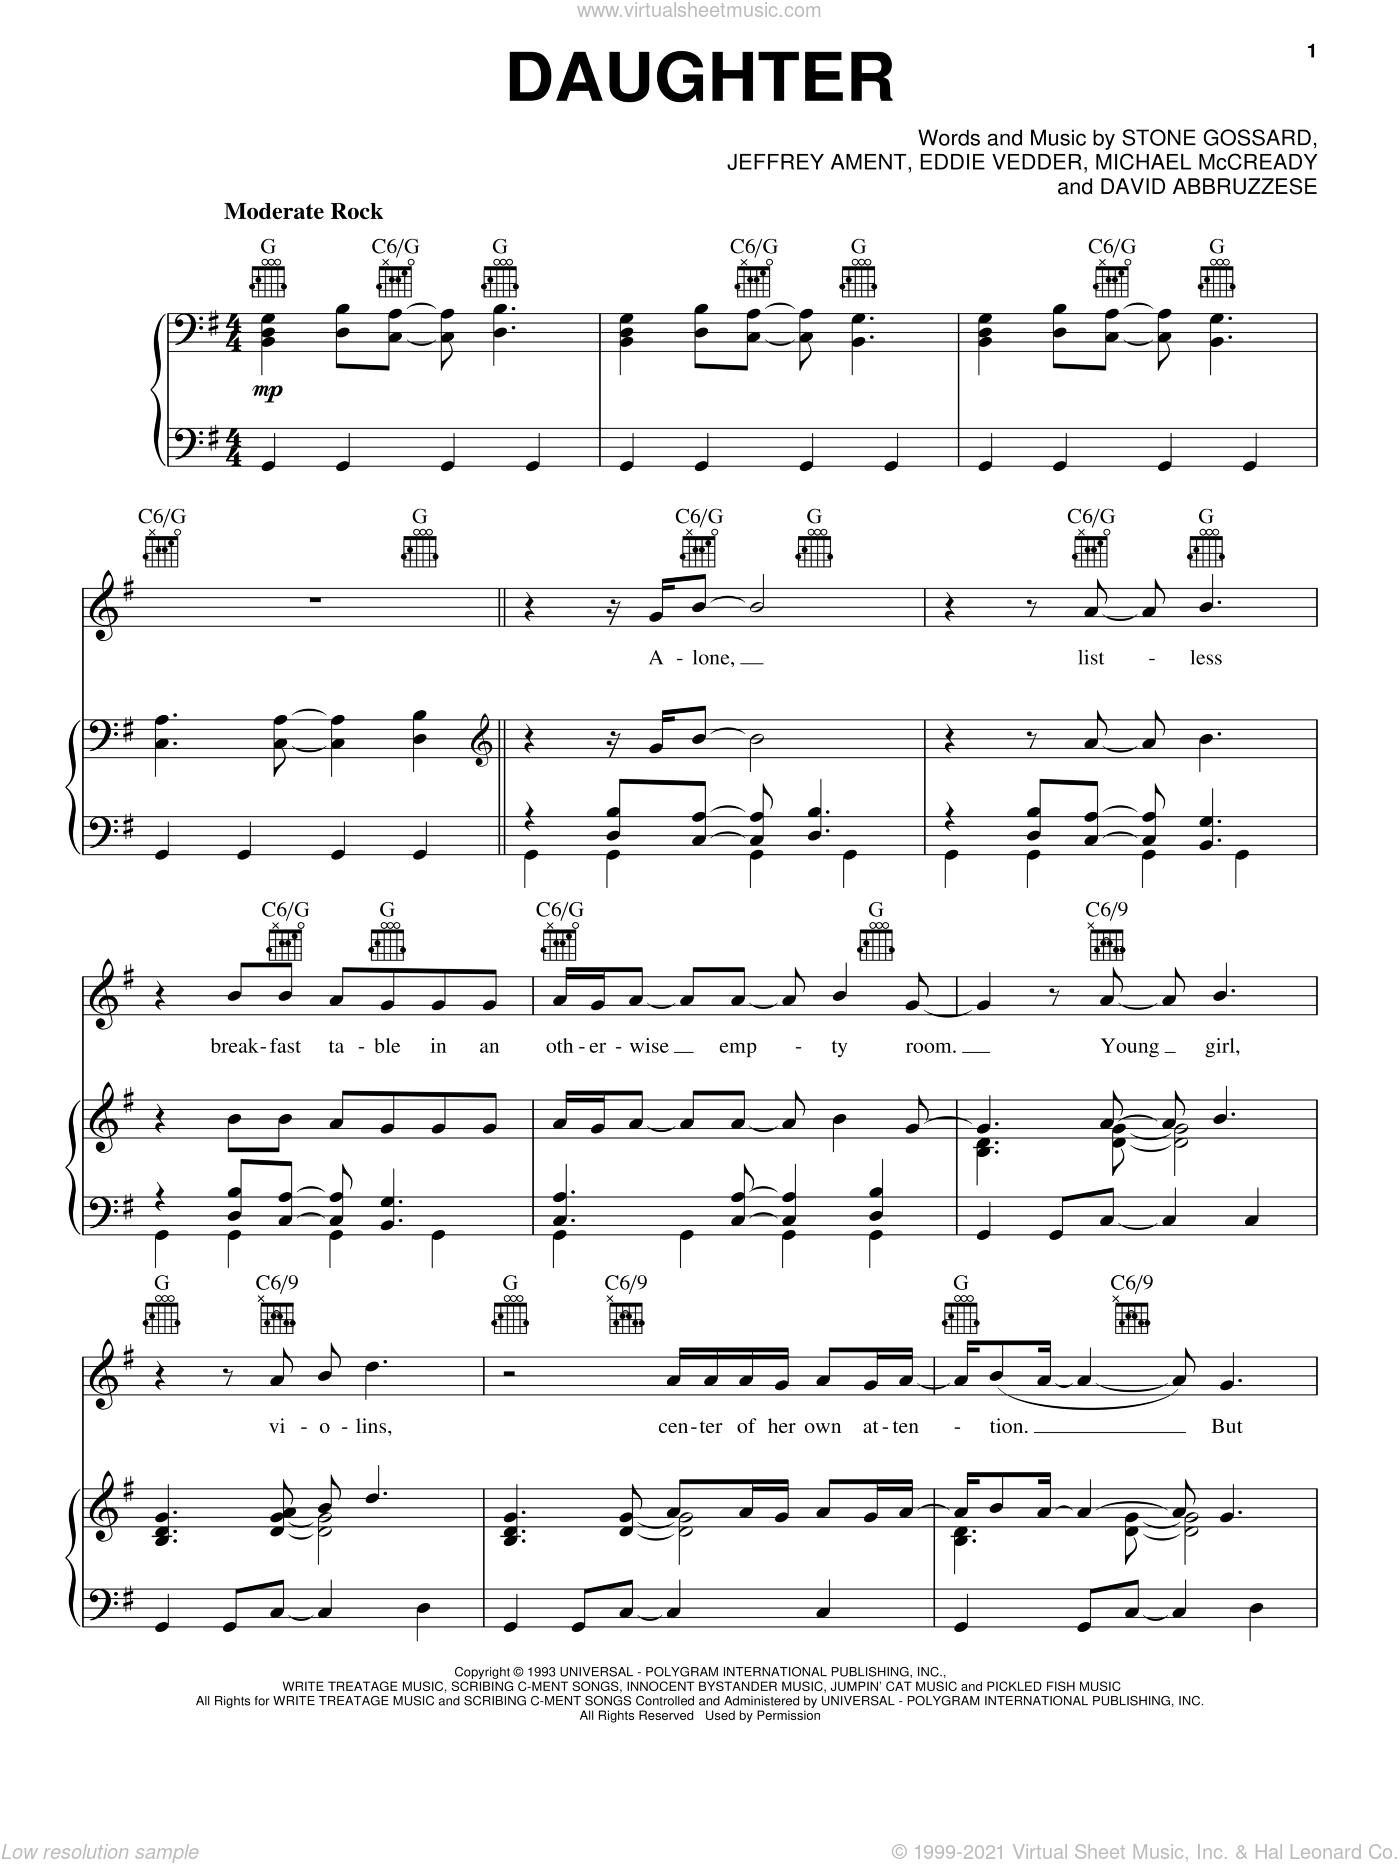 Daughter sheet music for voice, piano or guitar by Pearl Jam, David Abbruzzese, Eddie Vedder, Jeffrey Ament, Michael McCready and Stone Gossard, intermediate skill level